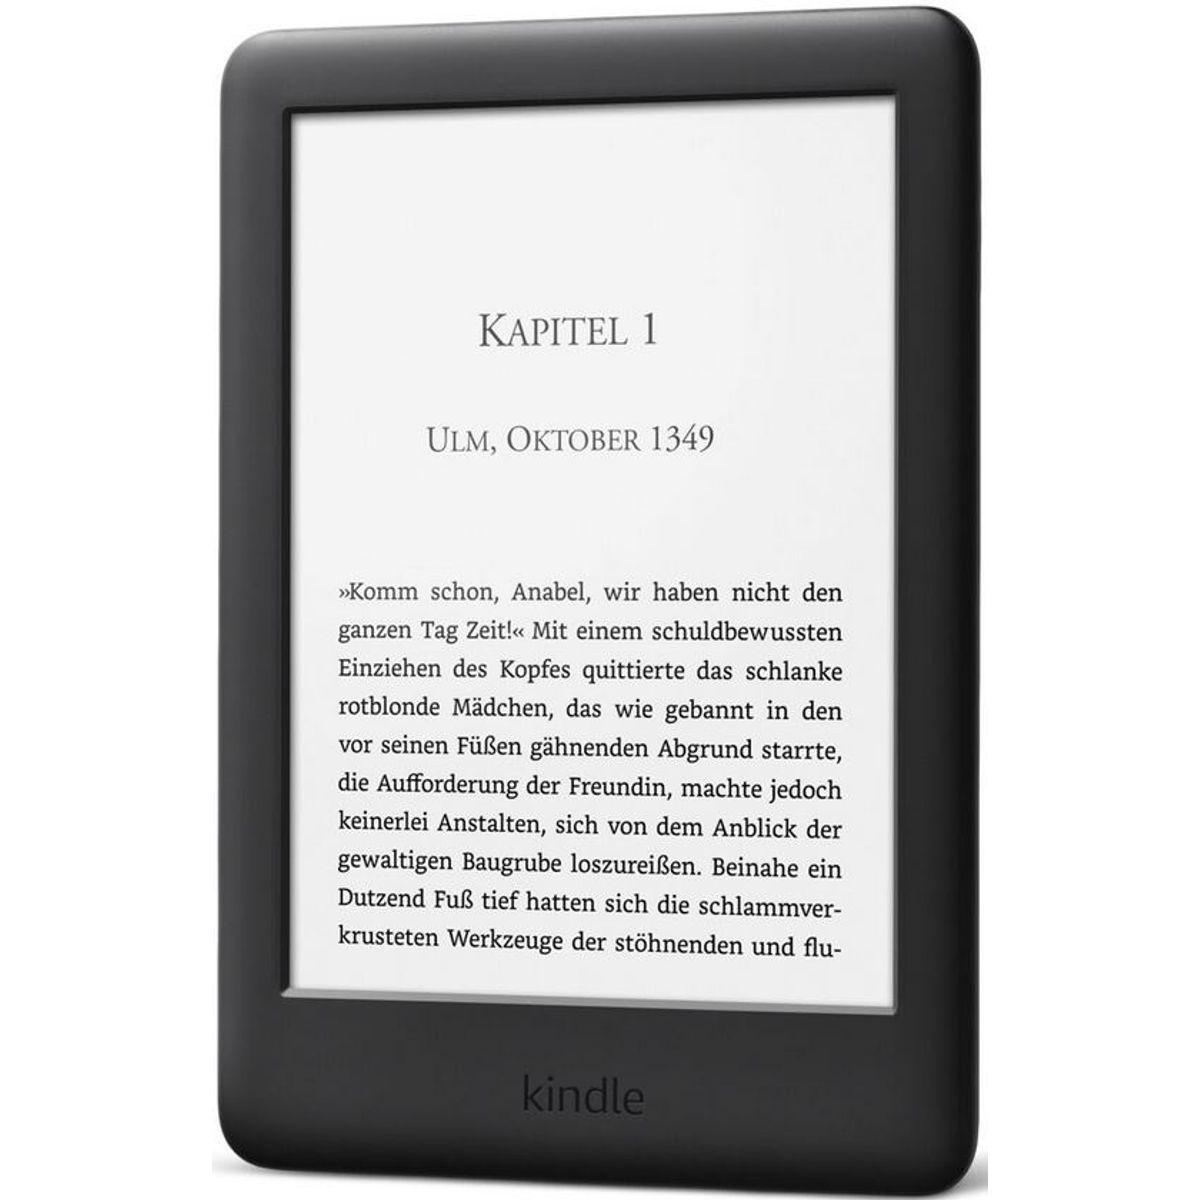 Amazon Kindle 2019 6″ Wifi 8Gb Black costel.md